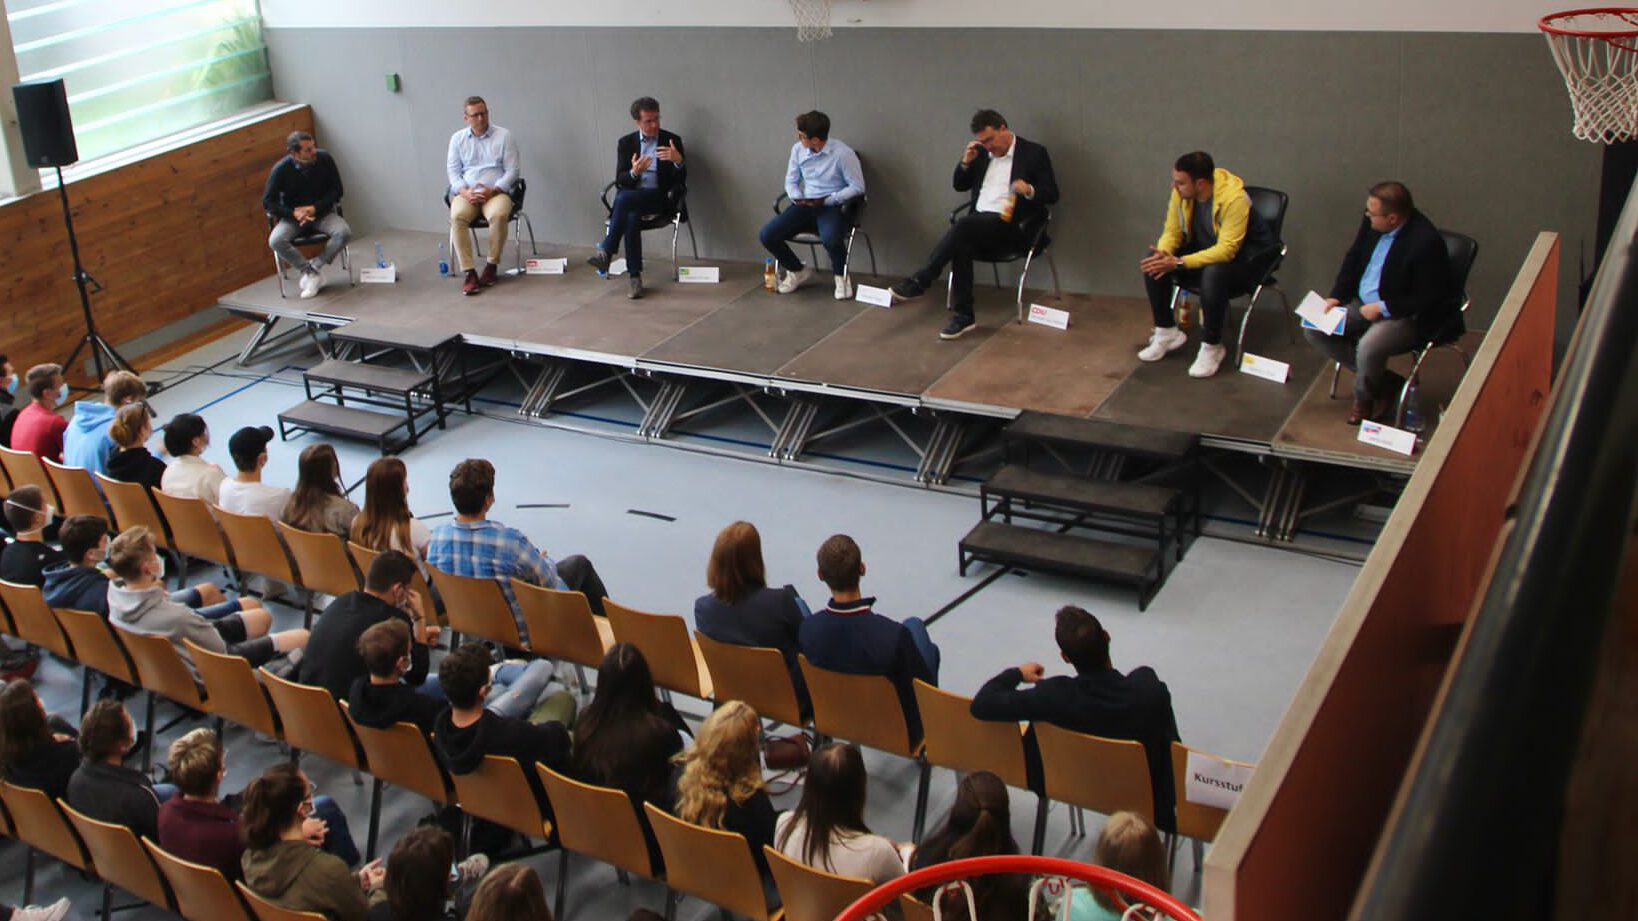 Politik hautnah erleben – Podiumsdiskussion am HGÖ